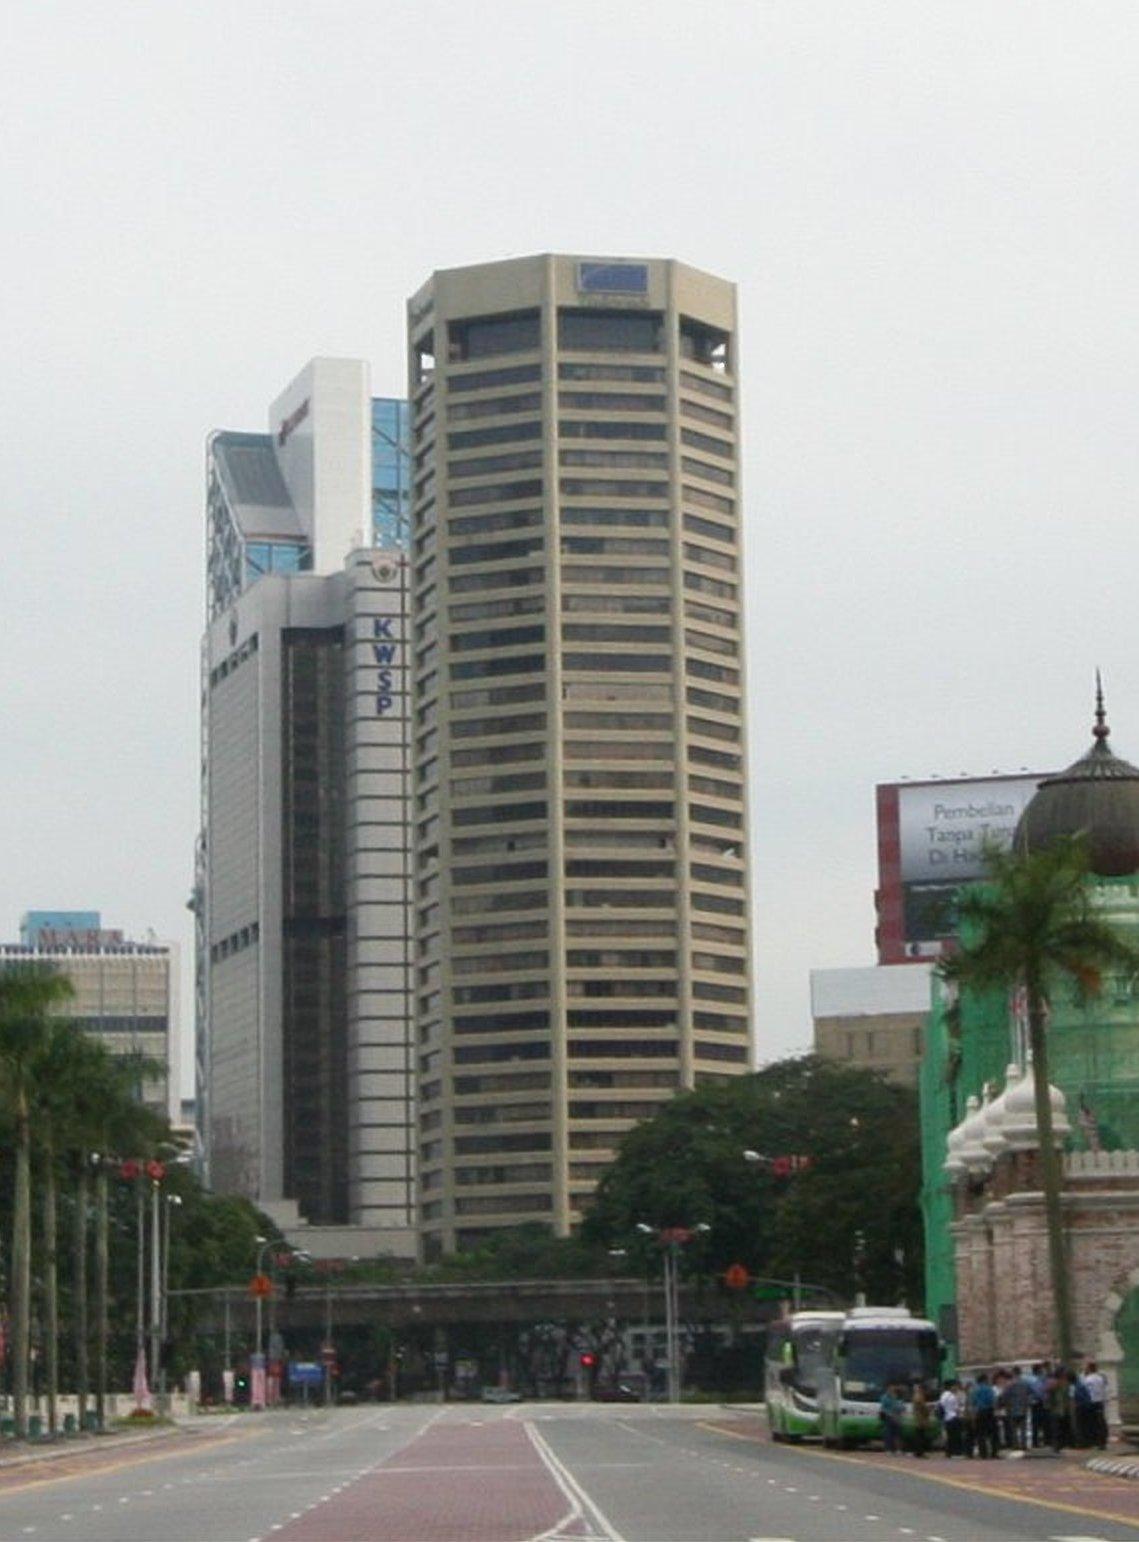 The 35-storey Menera Tun Razak was completed in 1983.